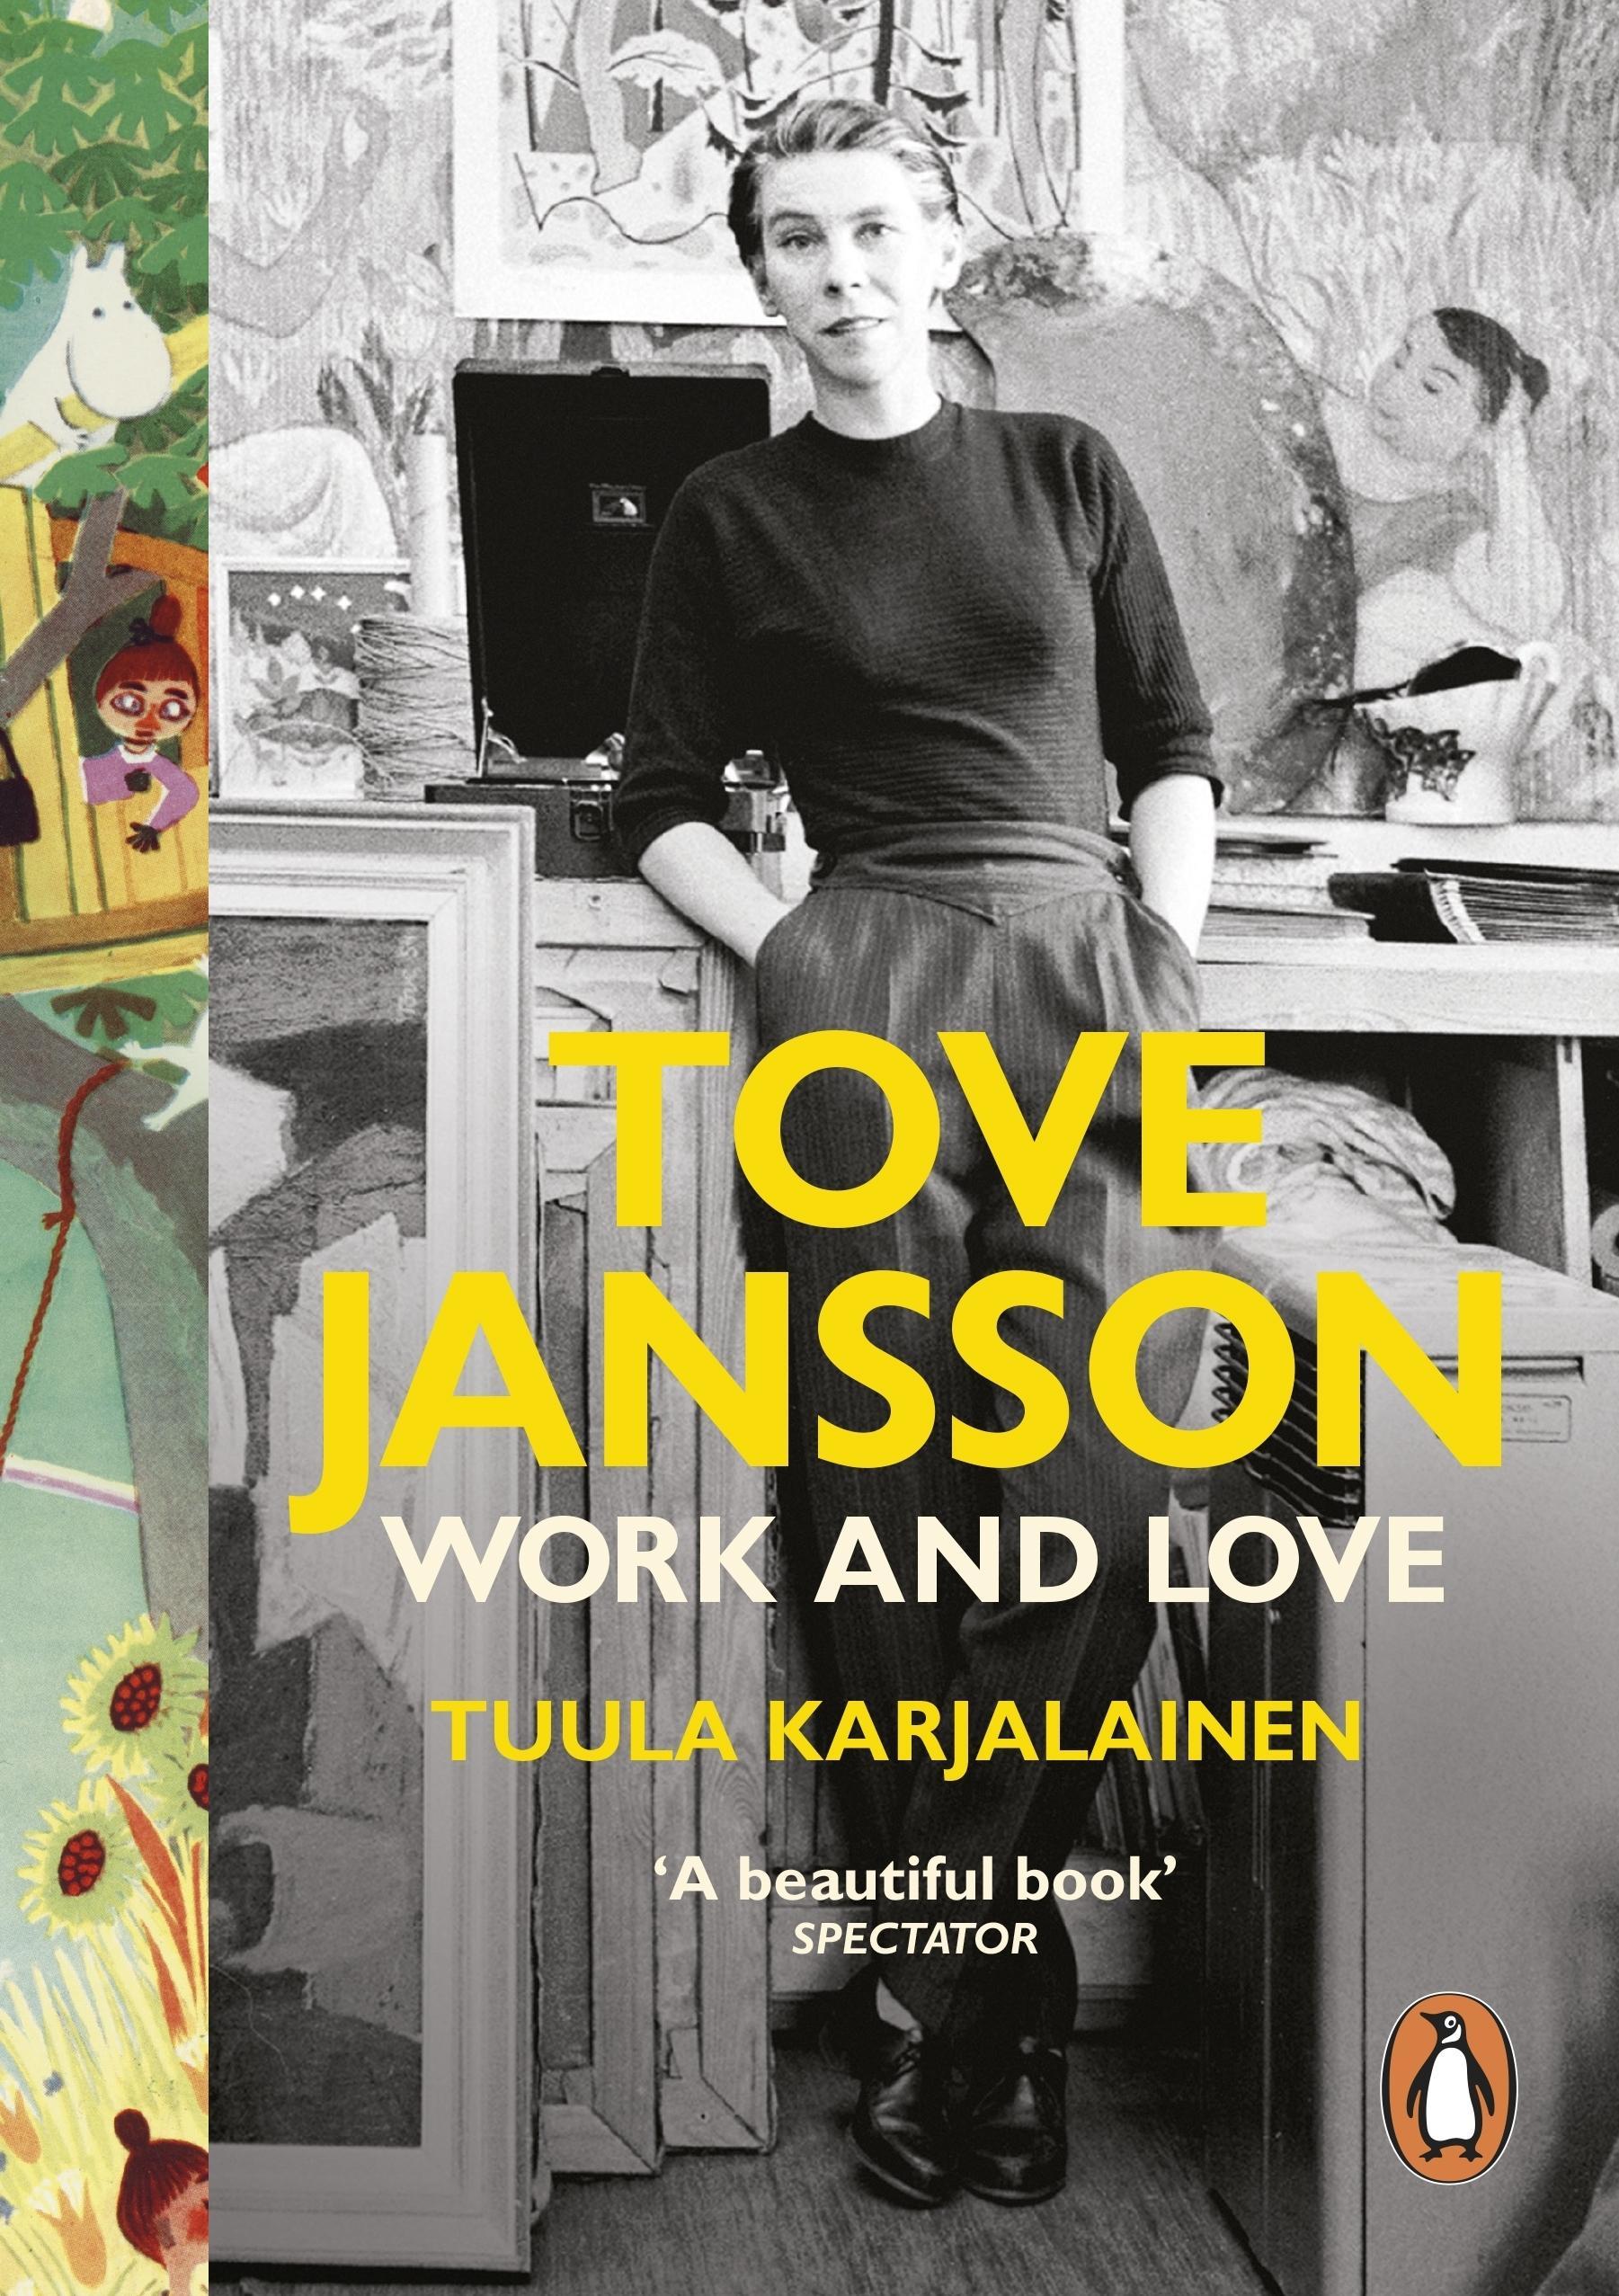 Tove Jansson: Work and Love